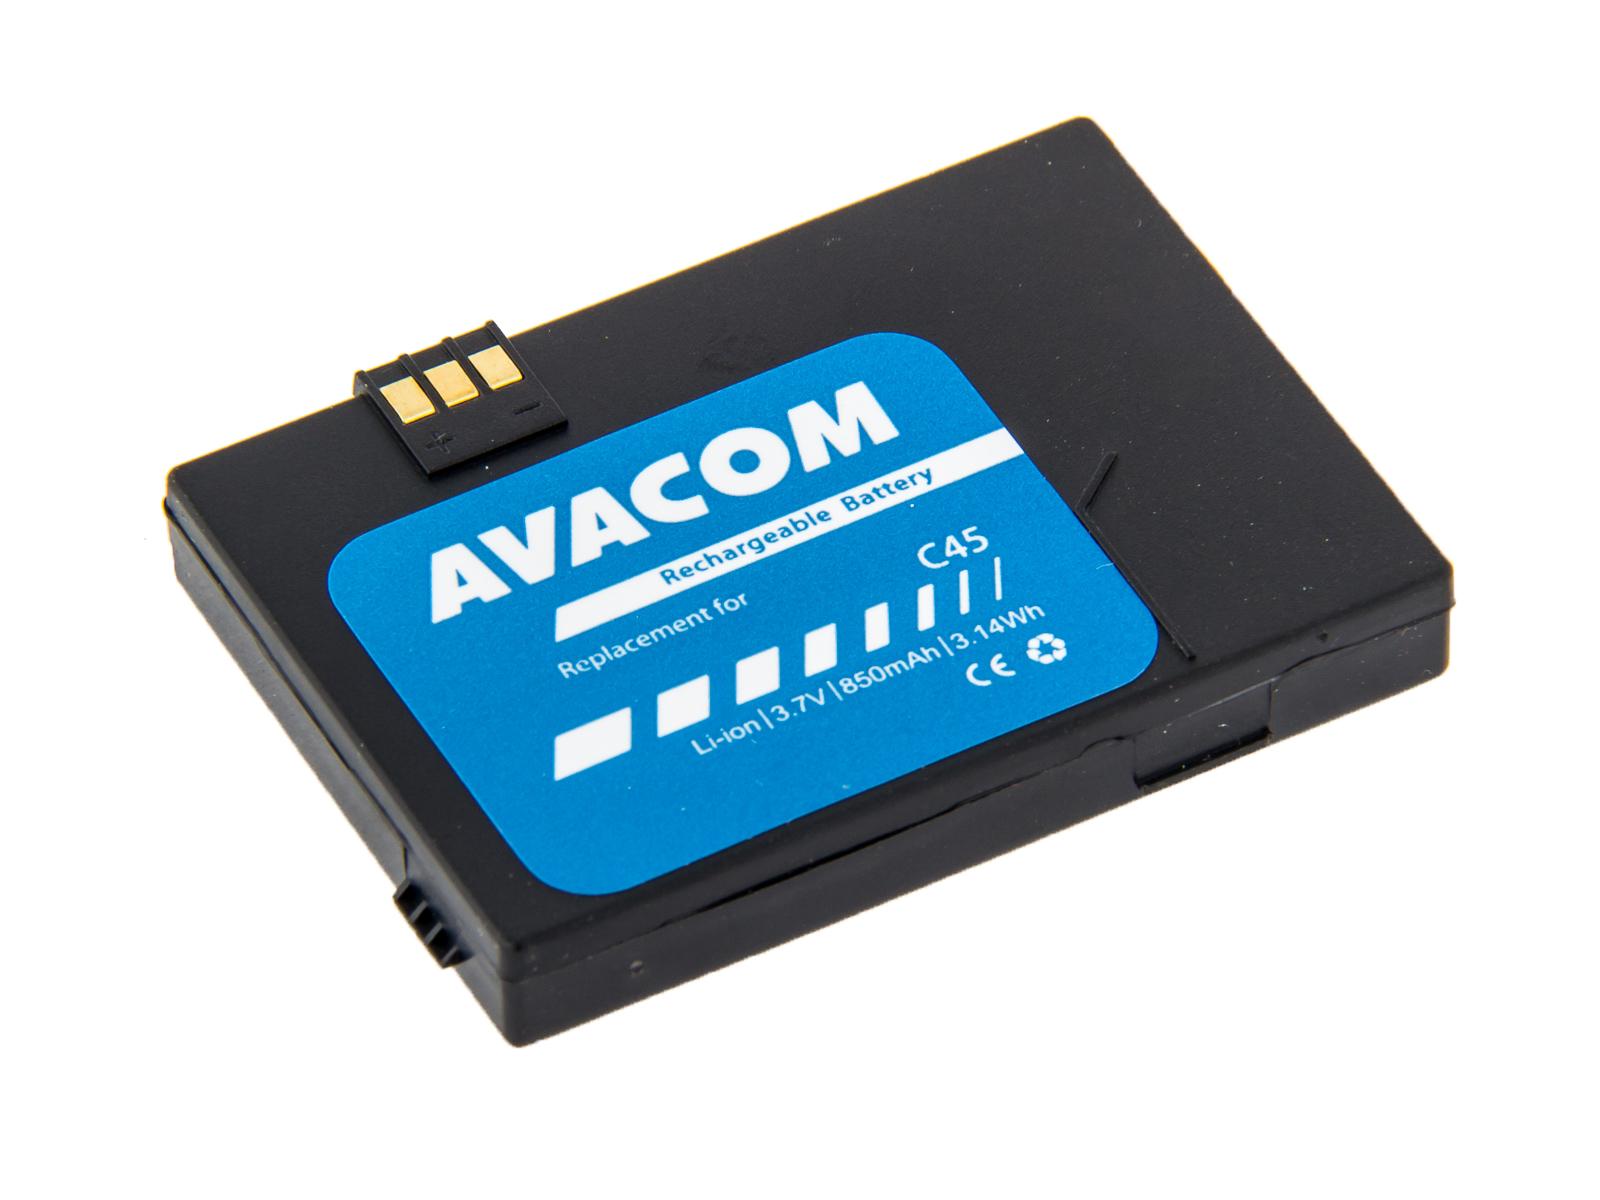 AVACOM Baterie do mobilu Siemens C45, A50, MT50 Li-Ion 3,6V 850mAh